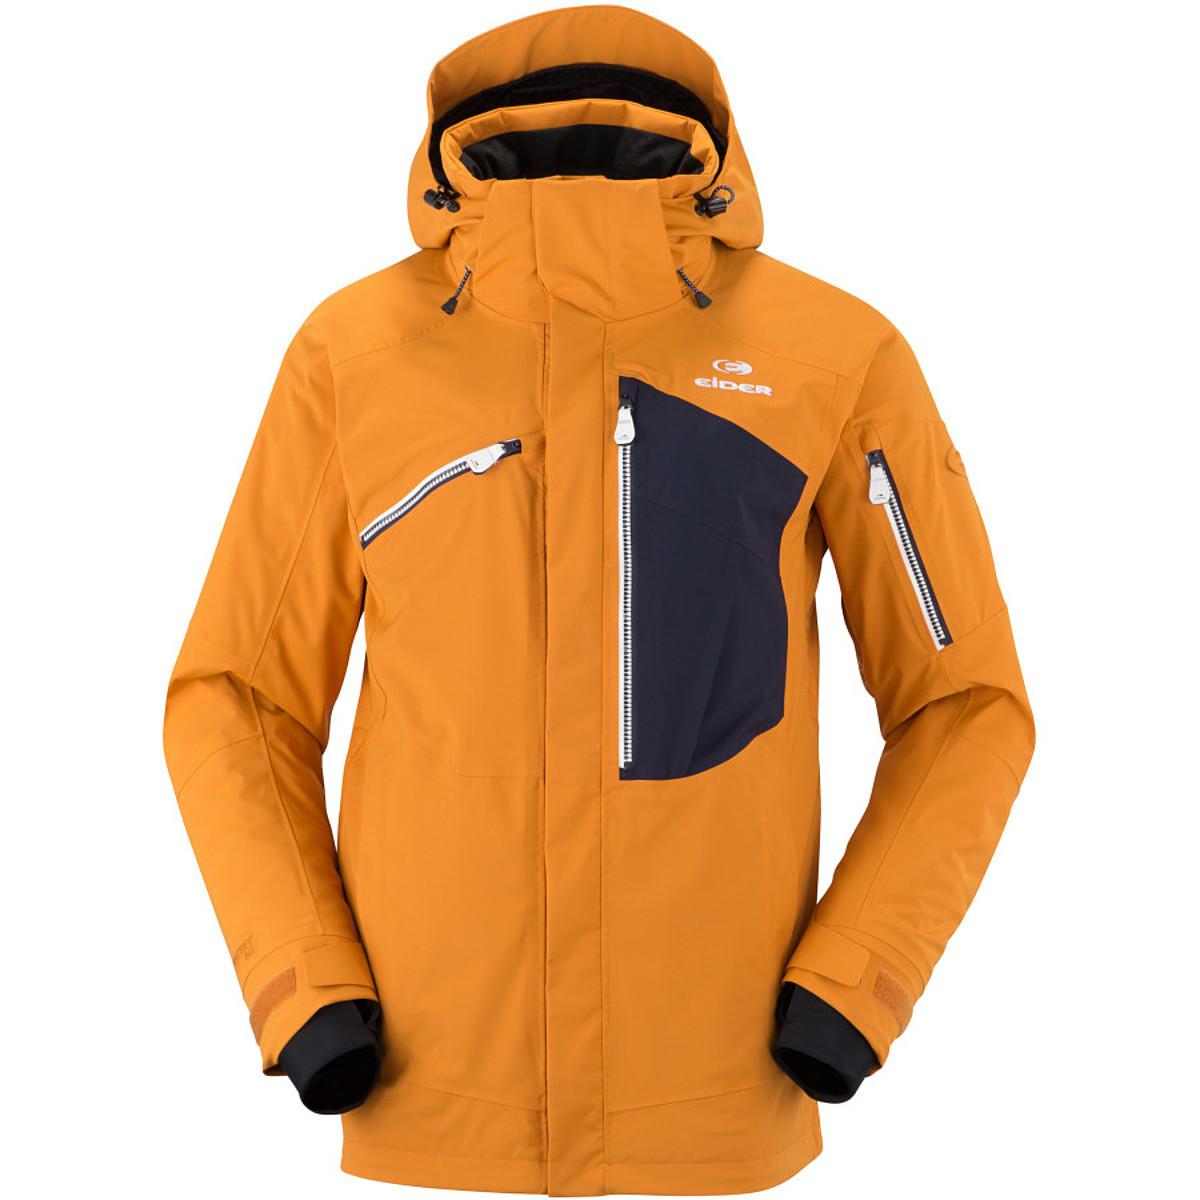 Eider Revelstoke Jacket